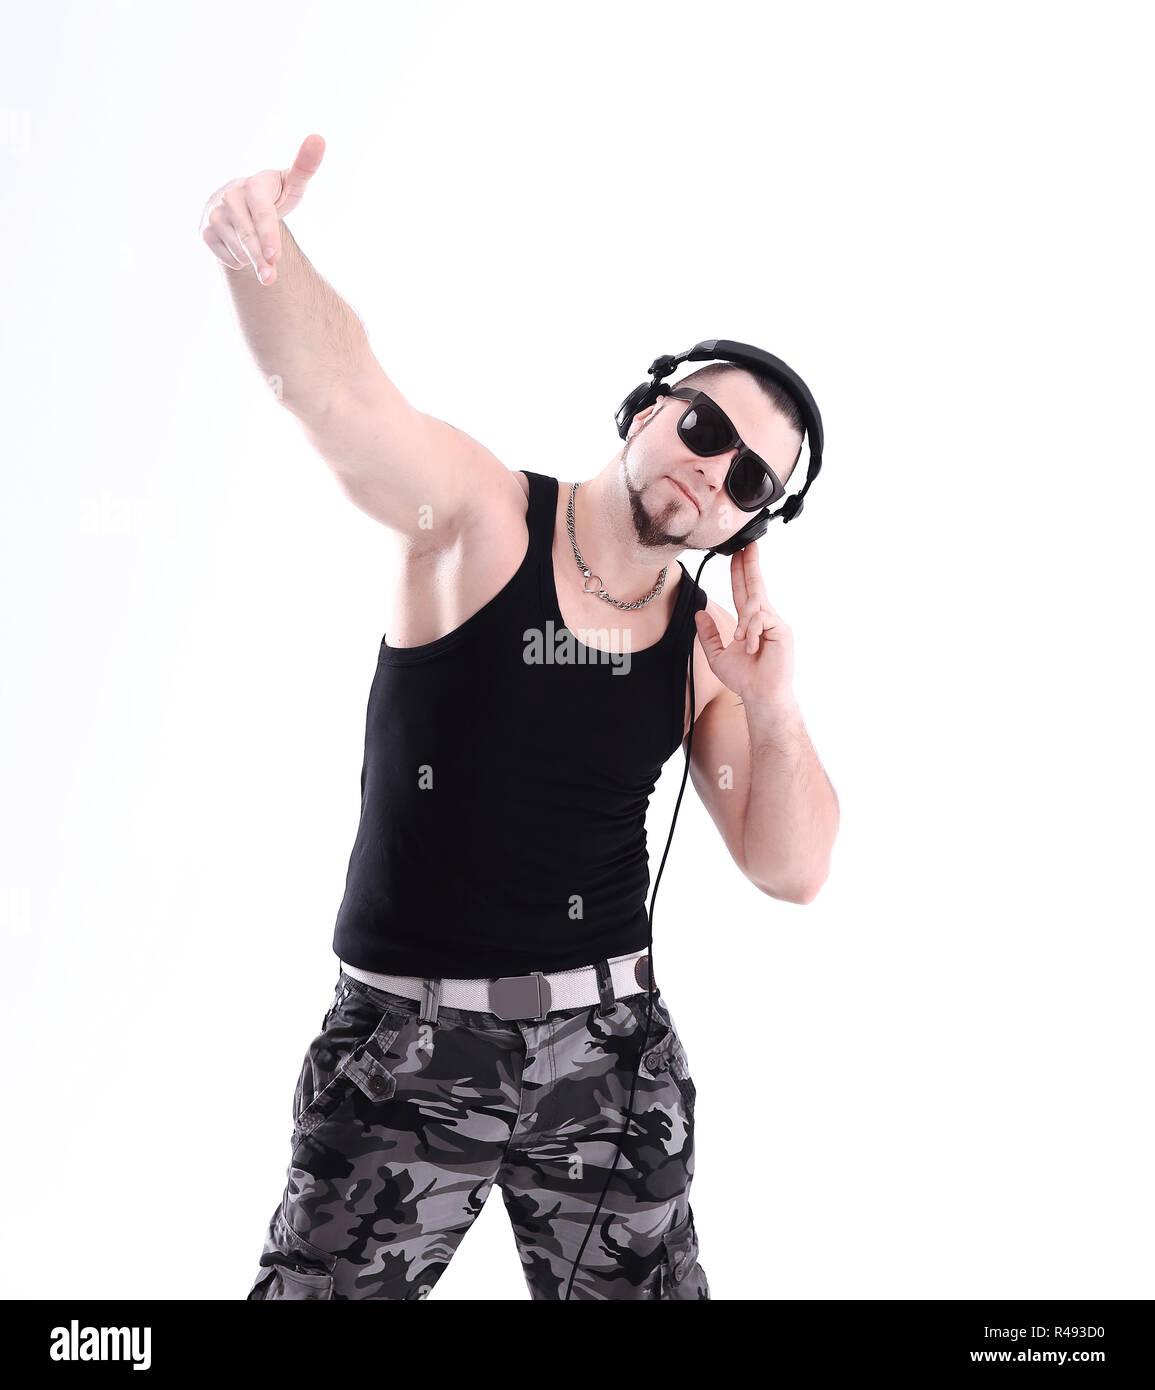 Modèle de mode urbaine. Hipster DJ Hip Hop Street dance style Banque ... 906794f207a